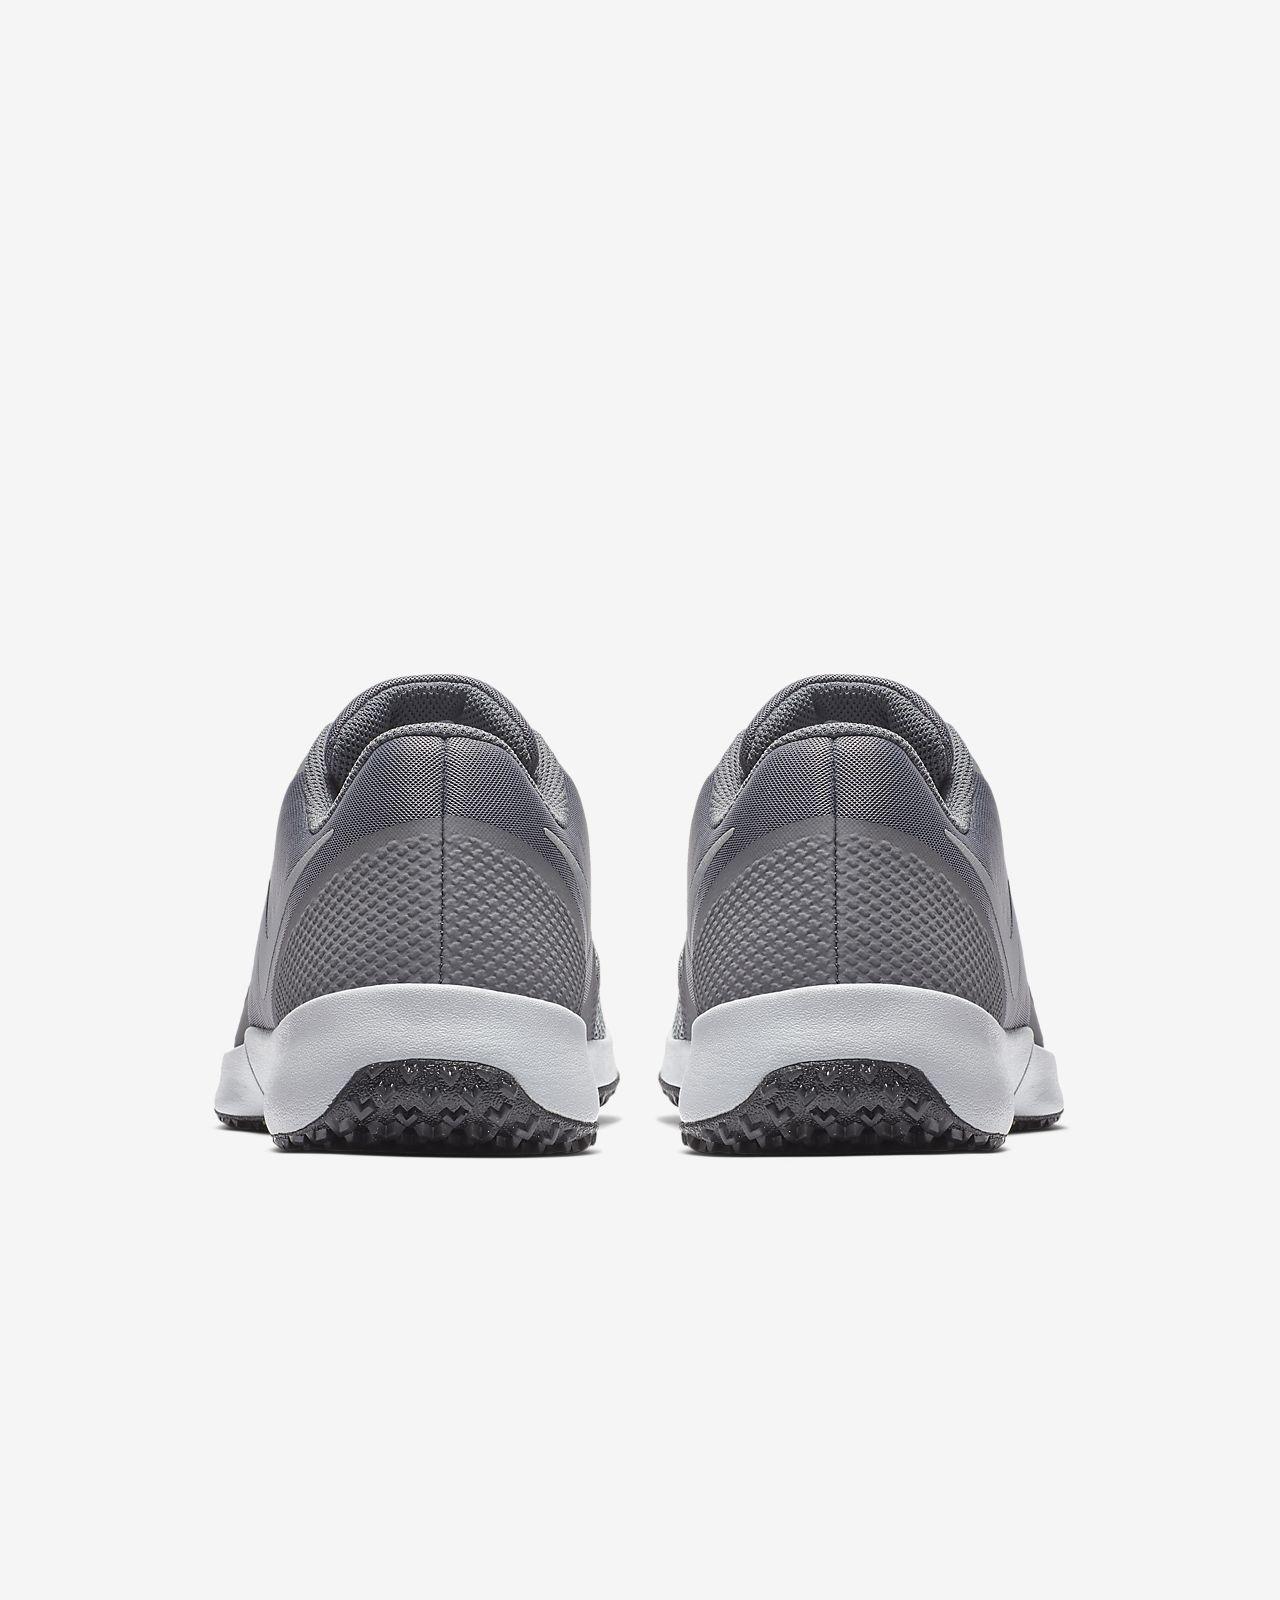 a3222291dacf Nike varsity compete trainer mens sport training shoe jpg 1280x1600 Nike  compete